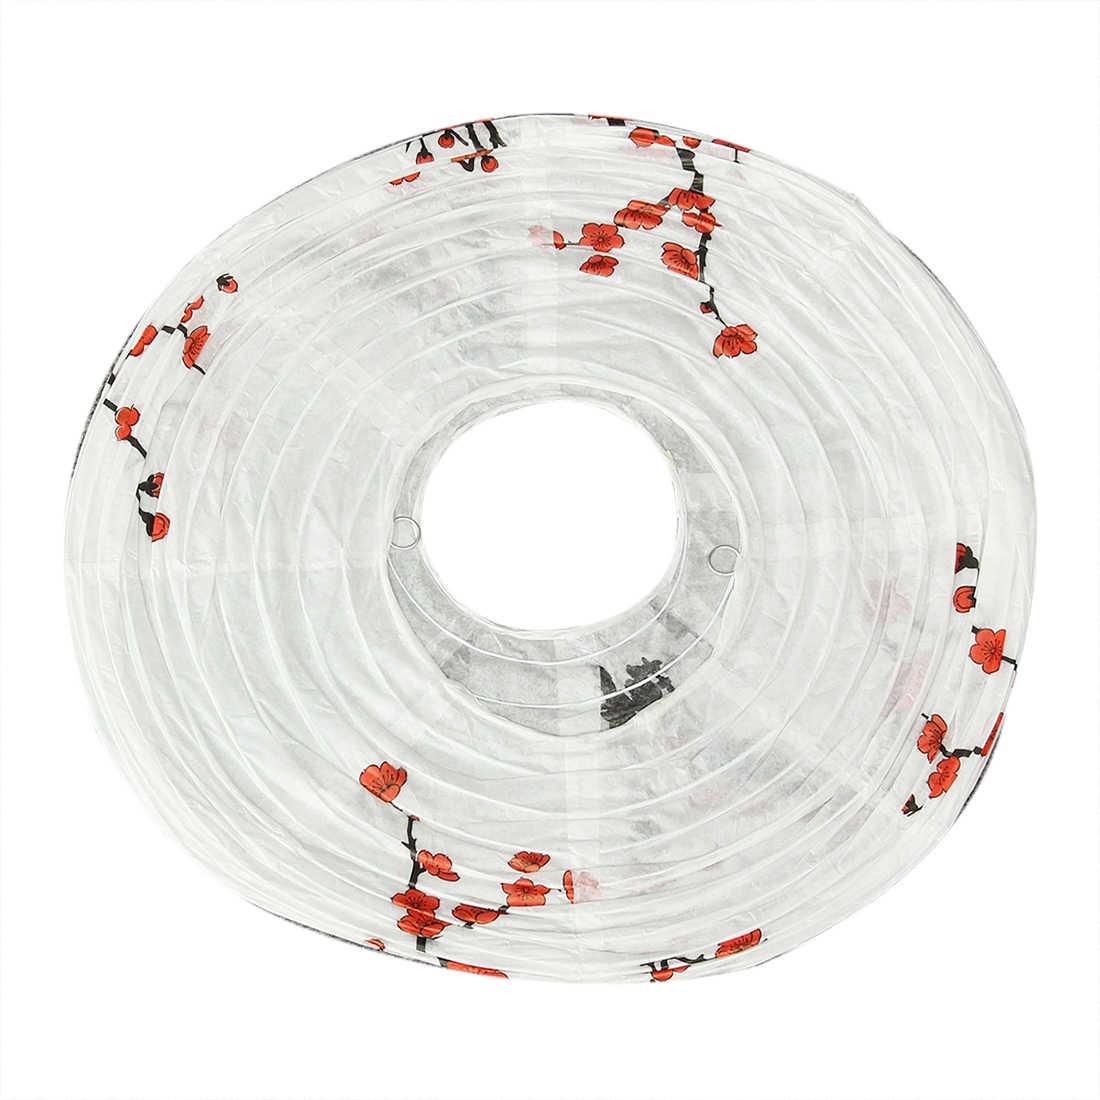 40cm Pantalla de papel linterna Pantalla de estilo oriental decoración ciruela Flor de moda linternas regalo decorativo ligero pantalla